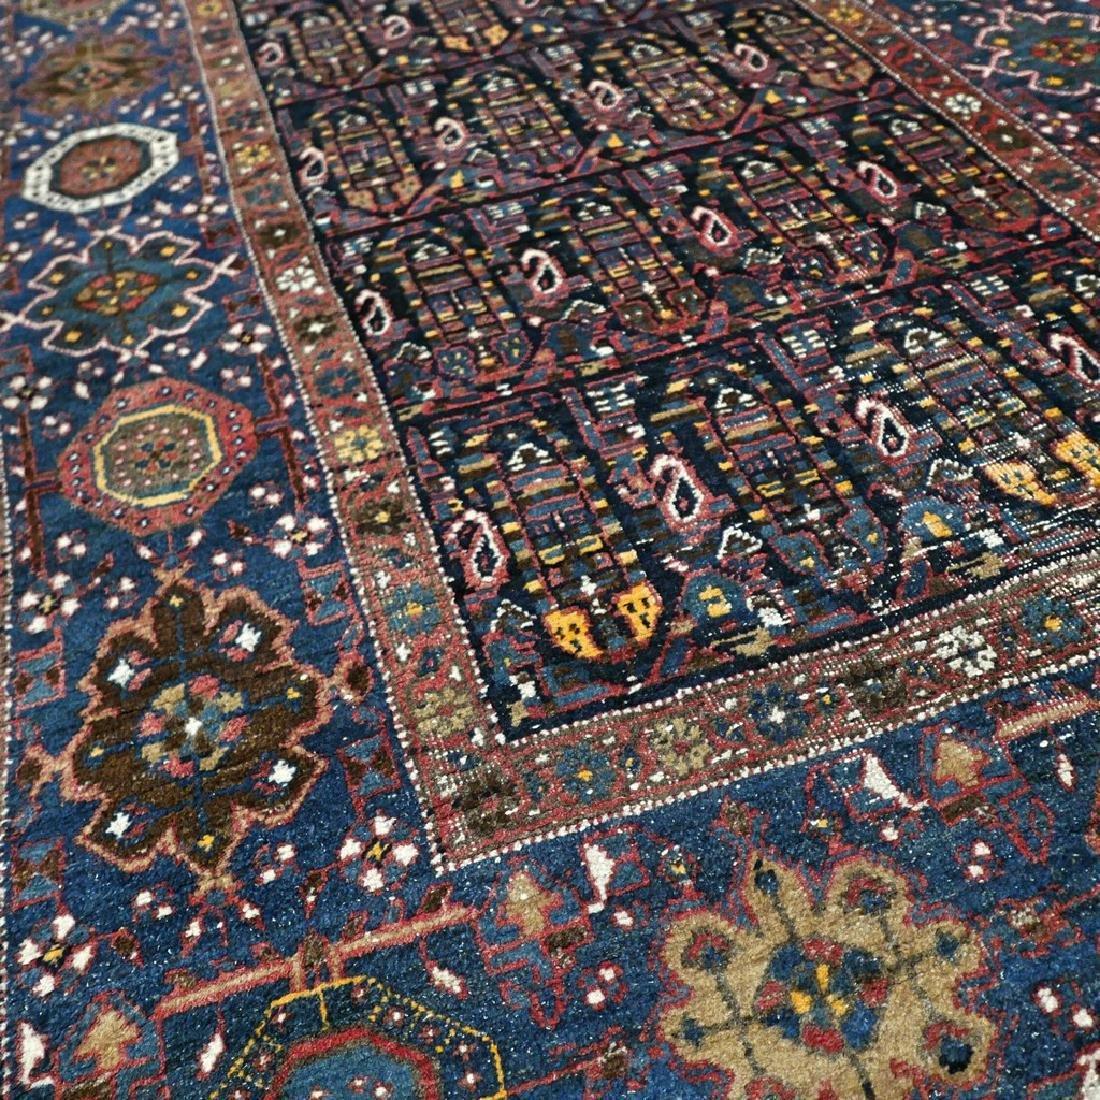 10.1x4.3 Antique Armenian boteh Kazak rug - 1880s - - 3